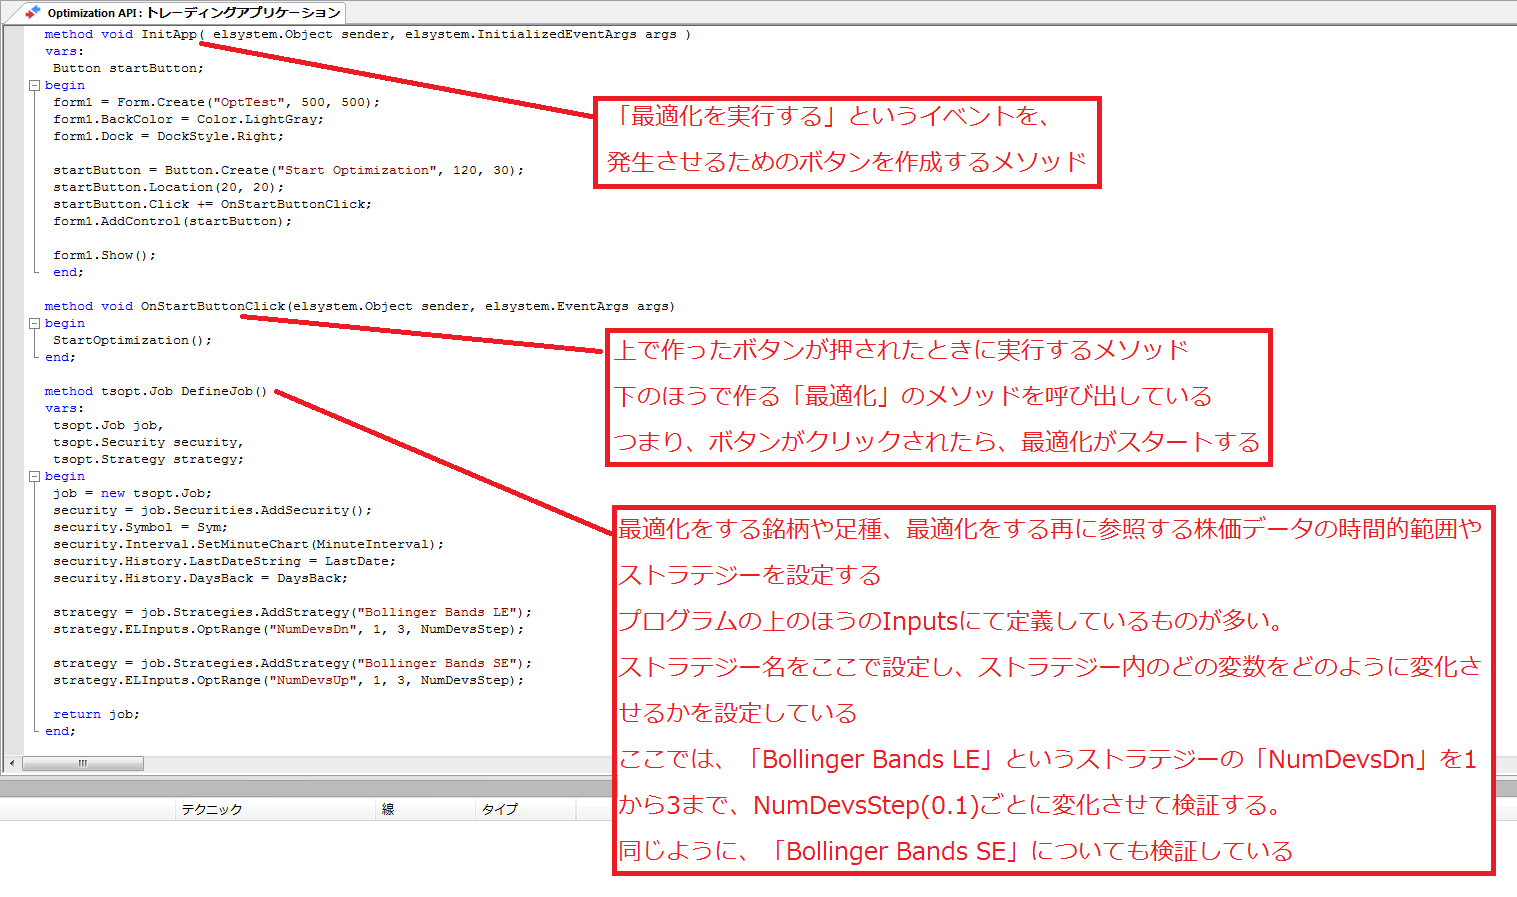 Optimization_API